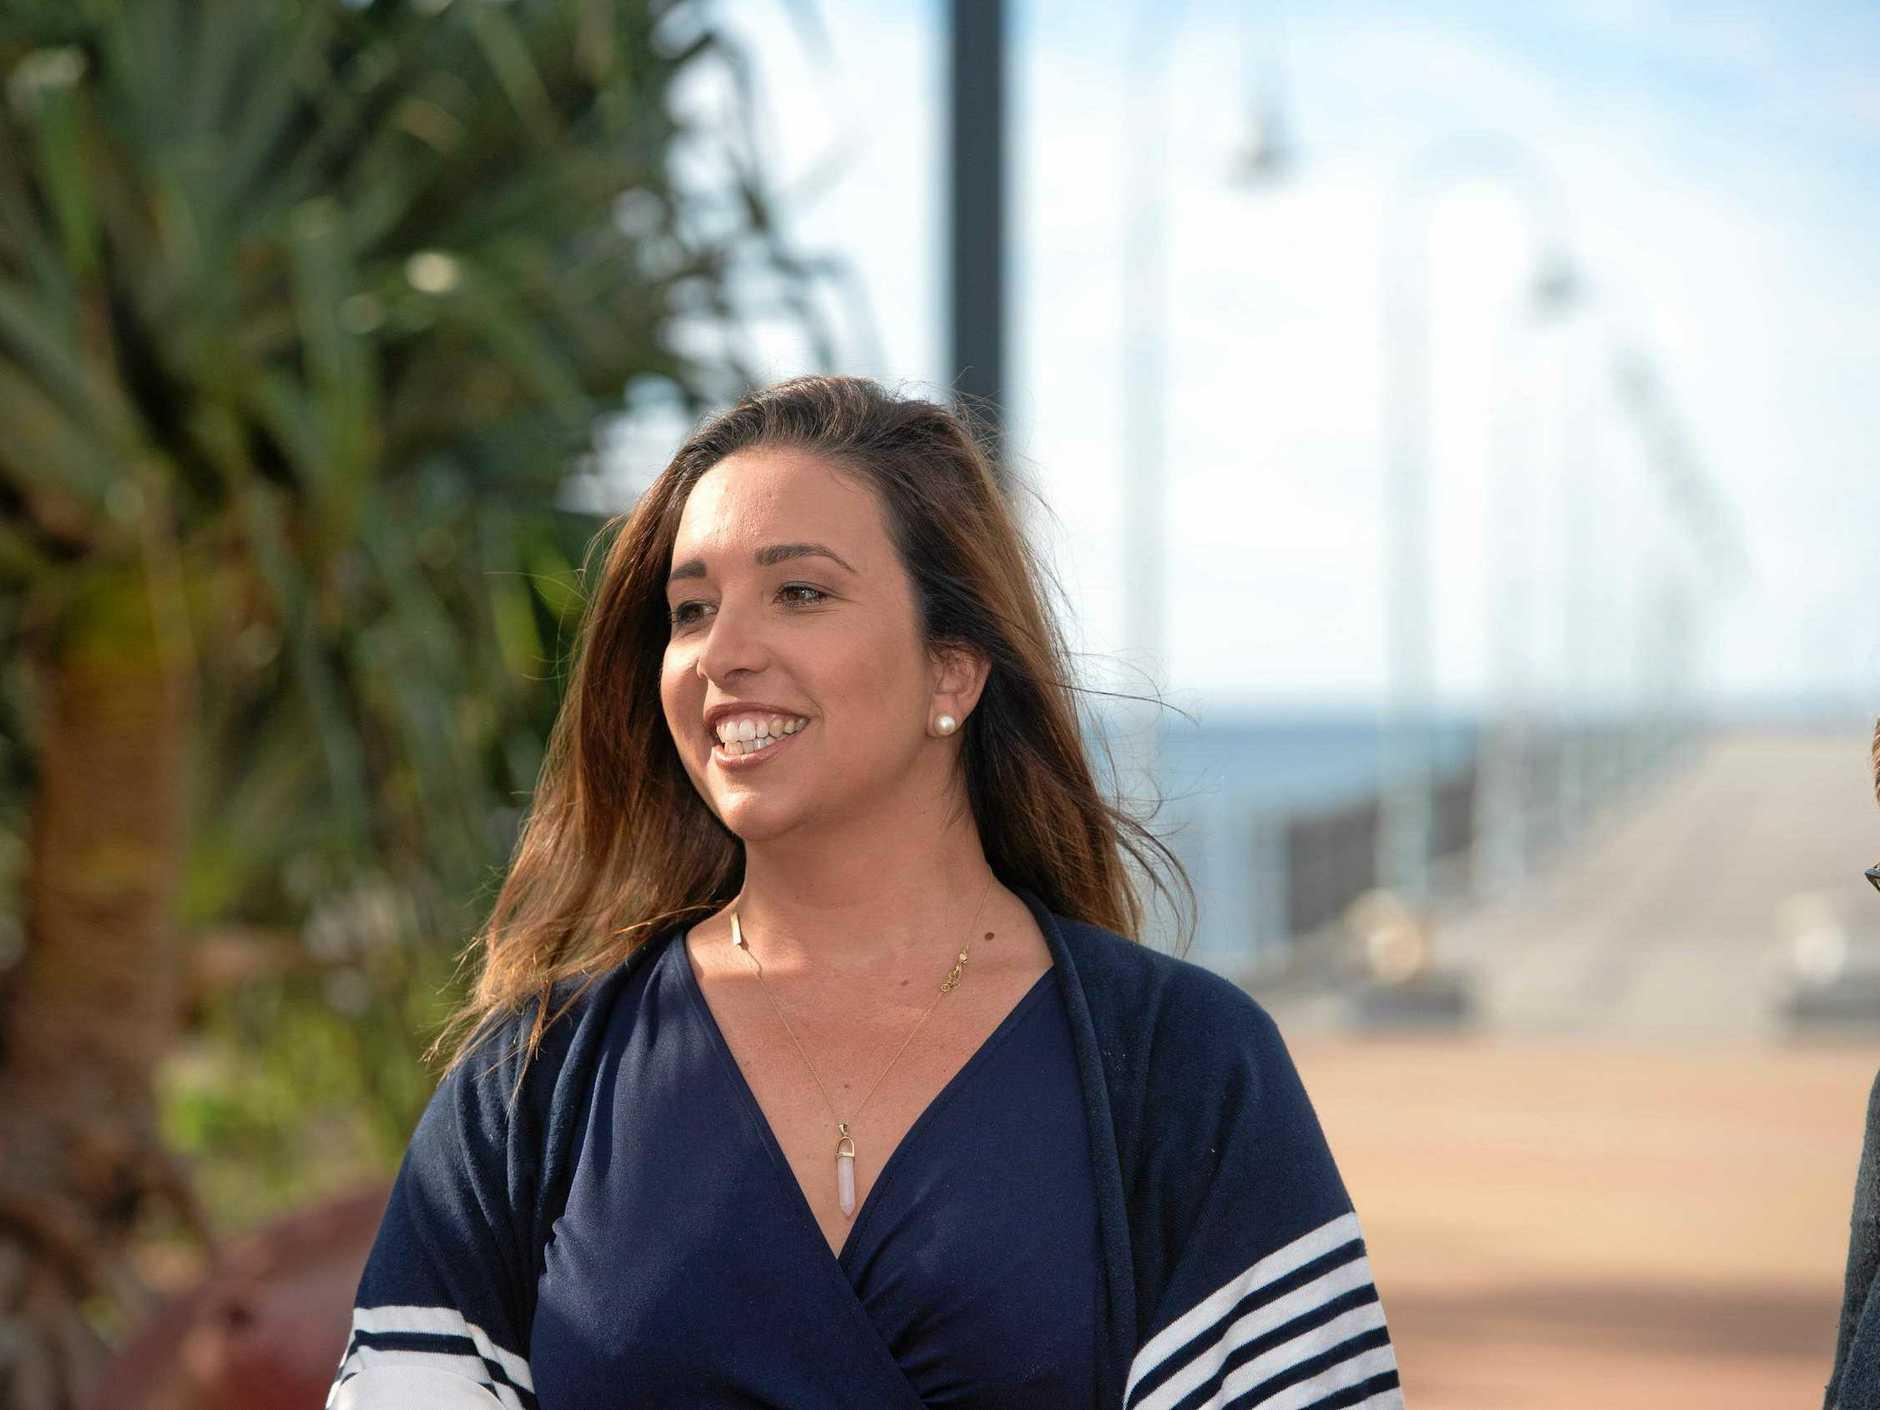 acting Coffs Harbour Mayor Tegan Swan. 27 MAY 2019